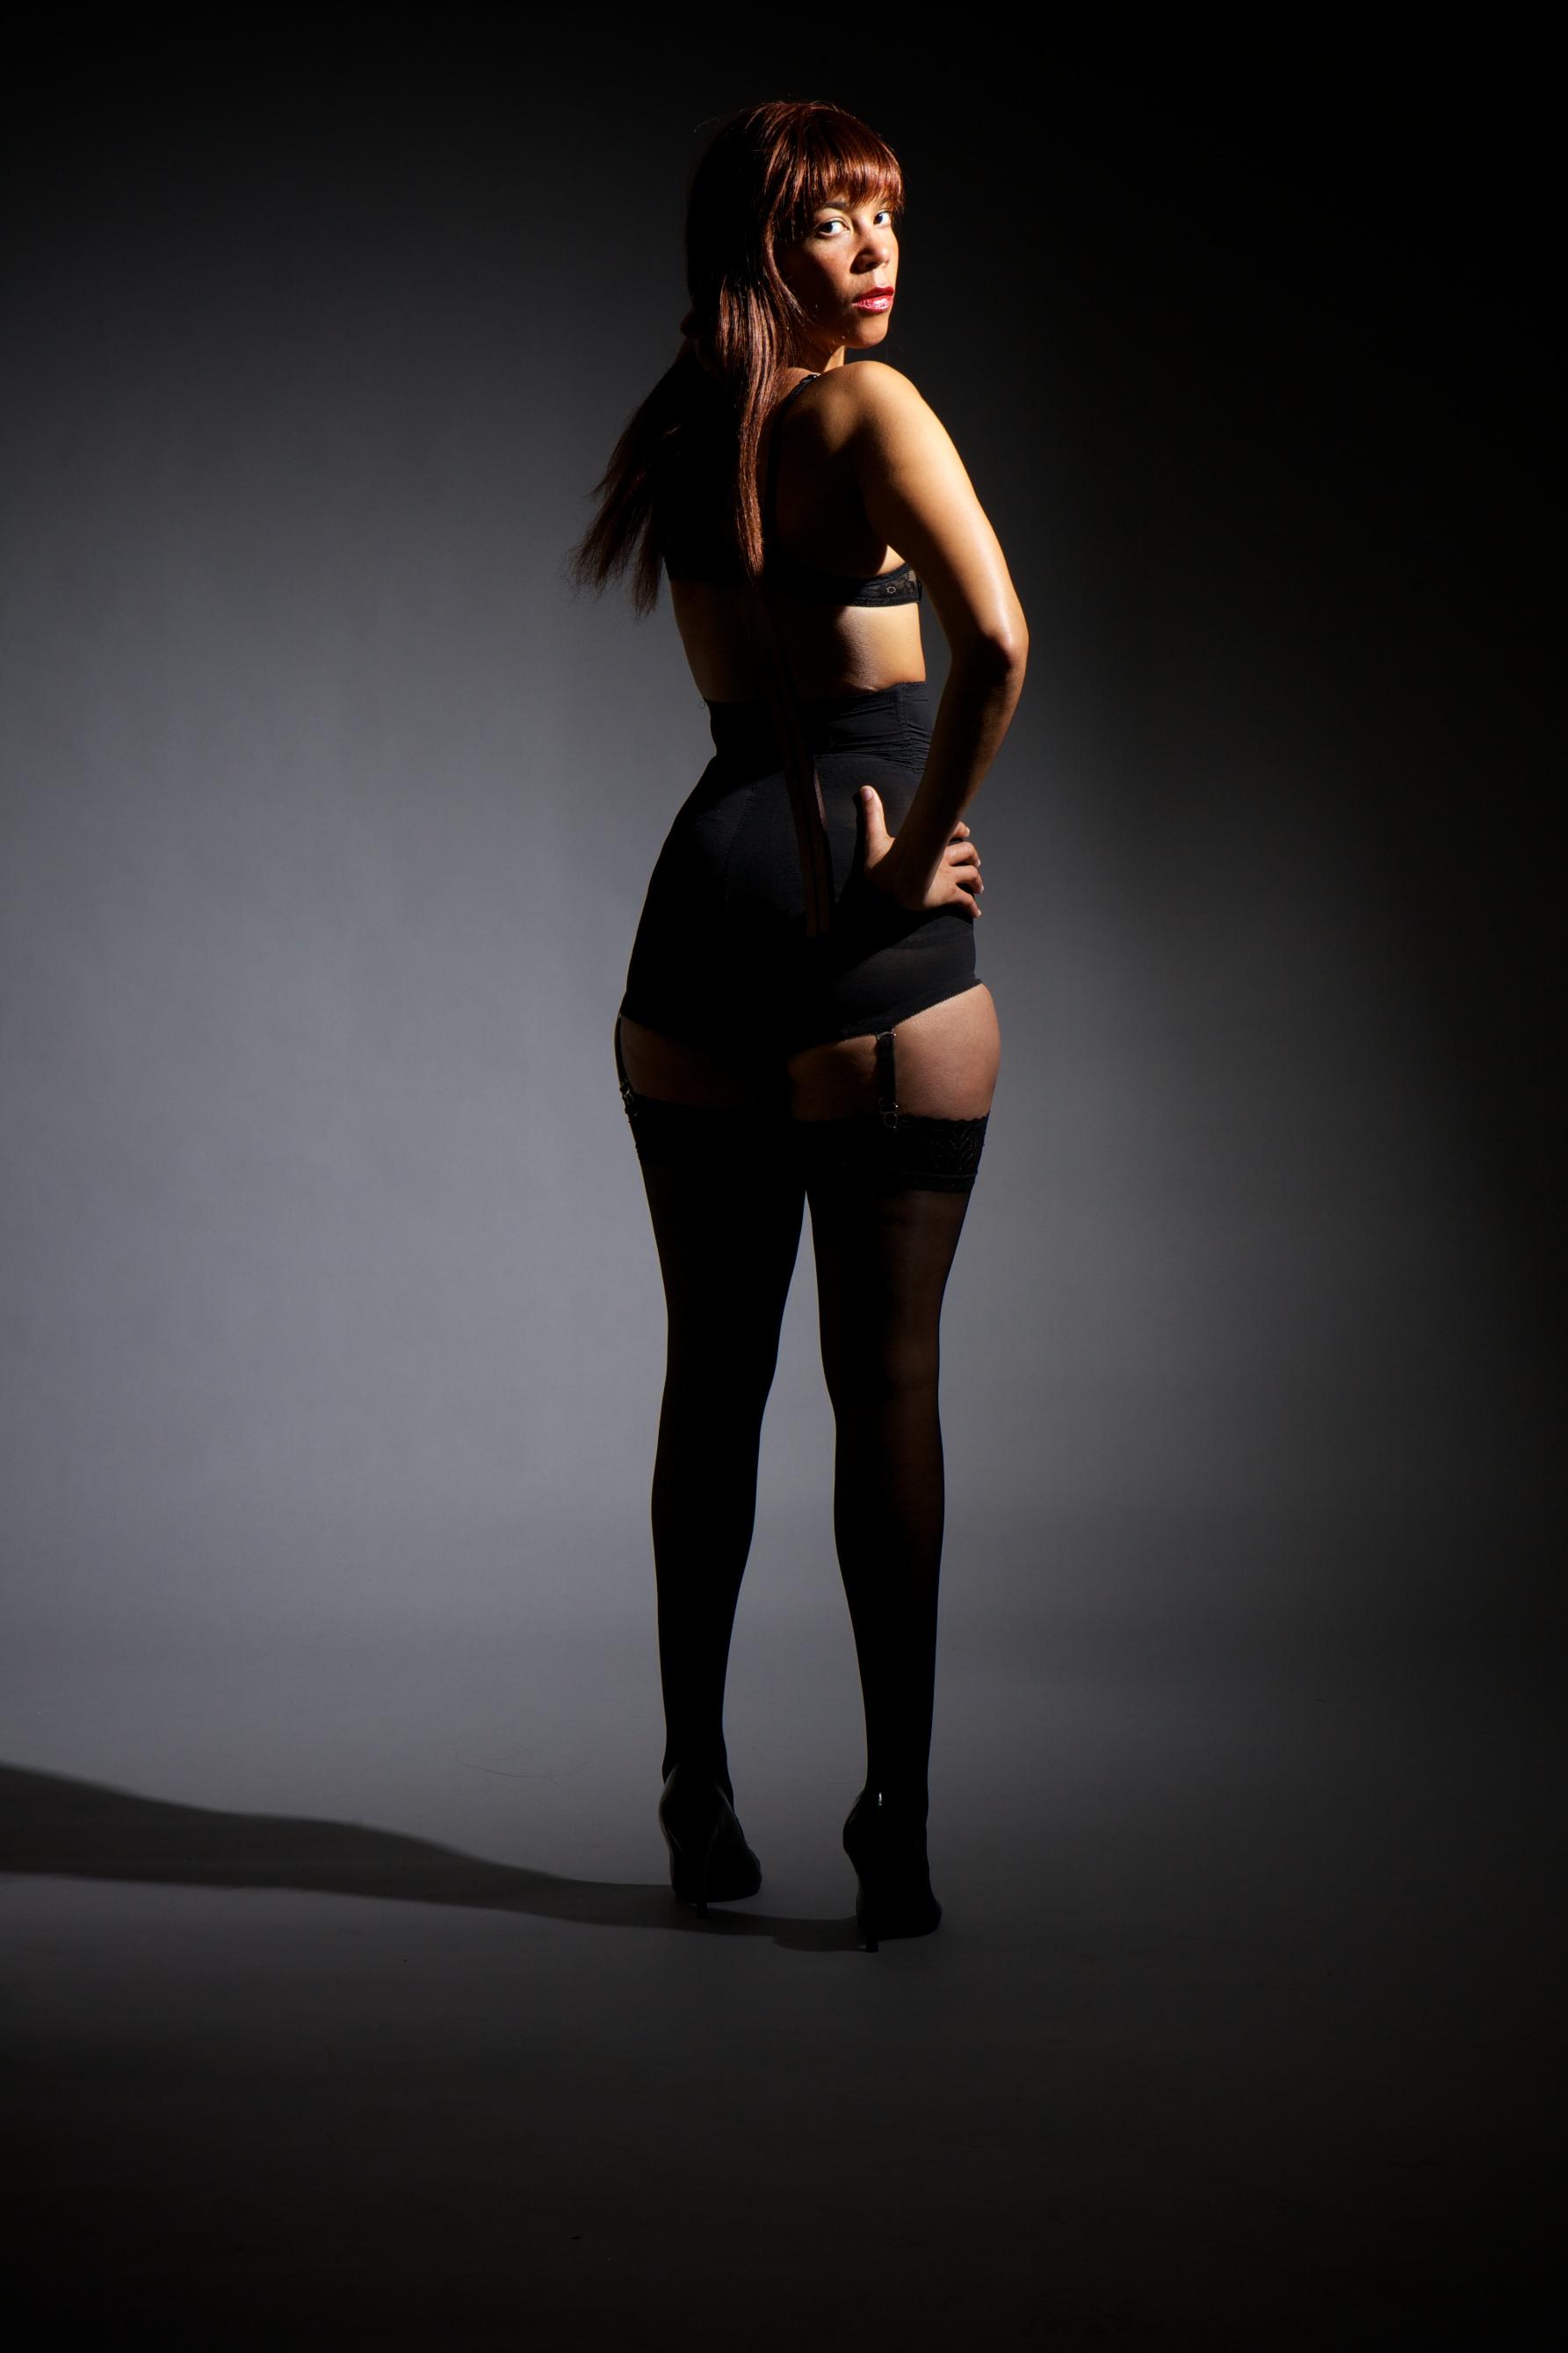 best-sexy-dungeon-mistress-franesca-harding-bondage-hard-spanking-nipple-play-caning-london-kings-cross